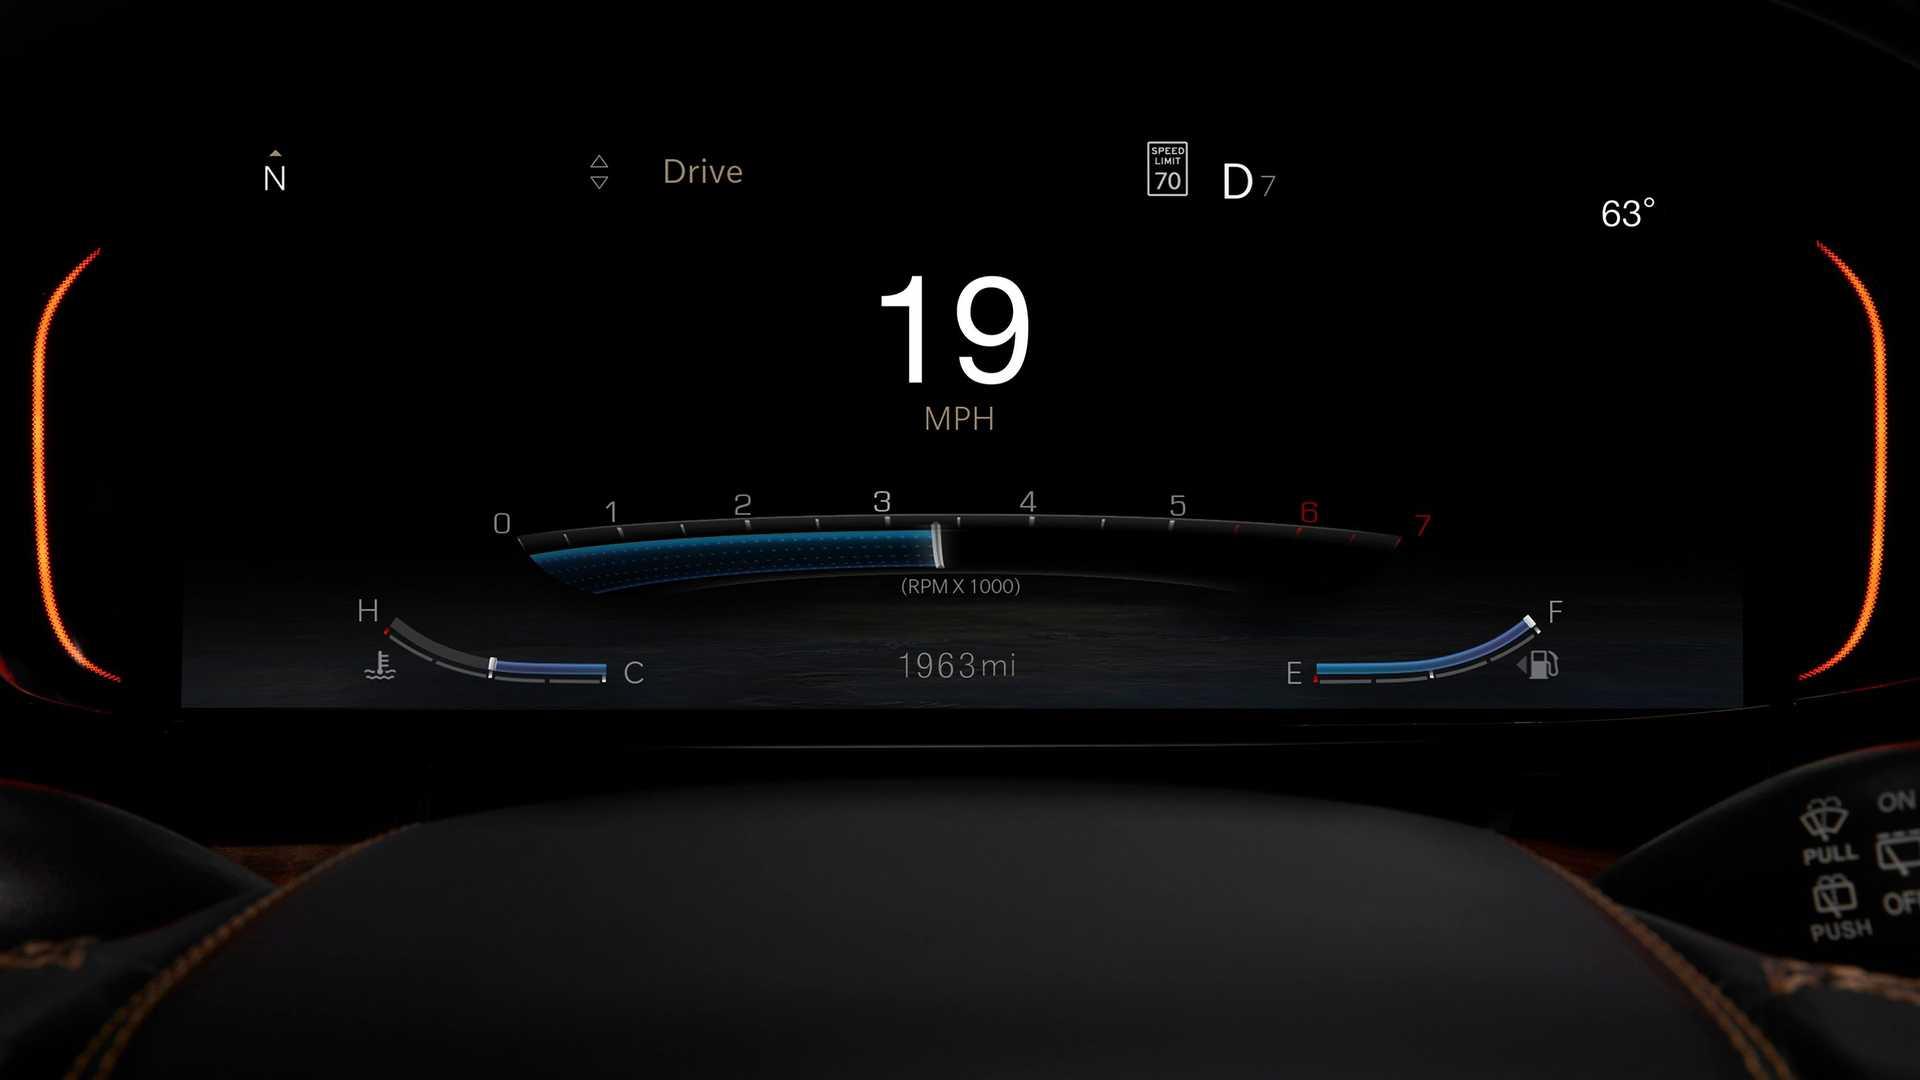 2022-jeep-wagoneer-interior-digital-instrument-cluster-3